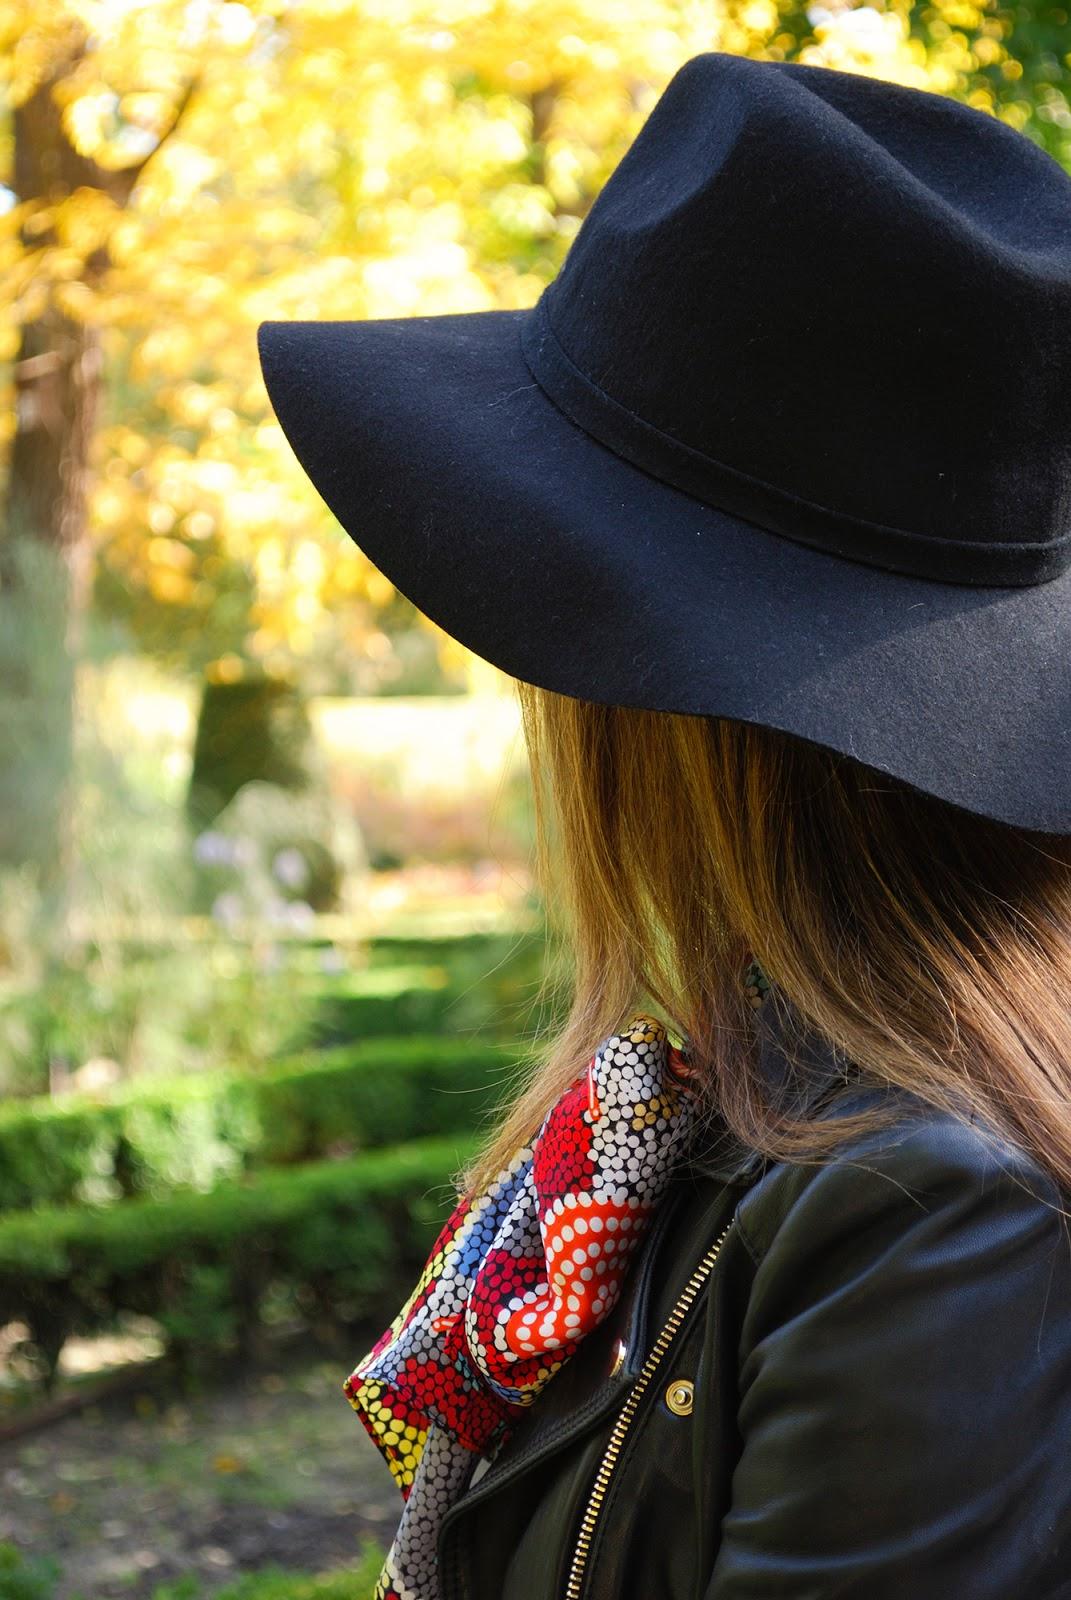 Royal Botanic Gardens fall autumn Madrid